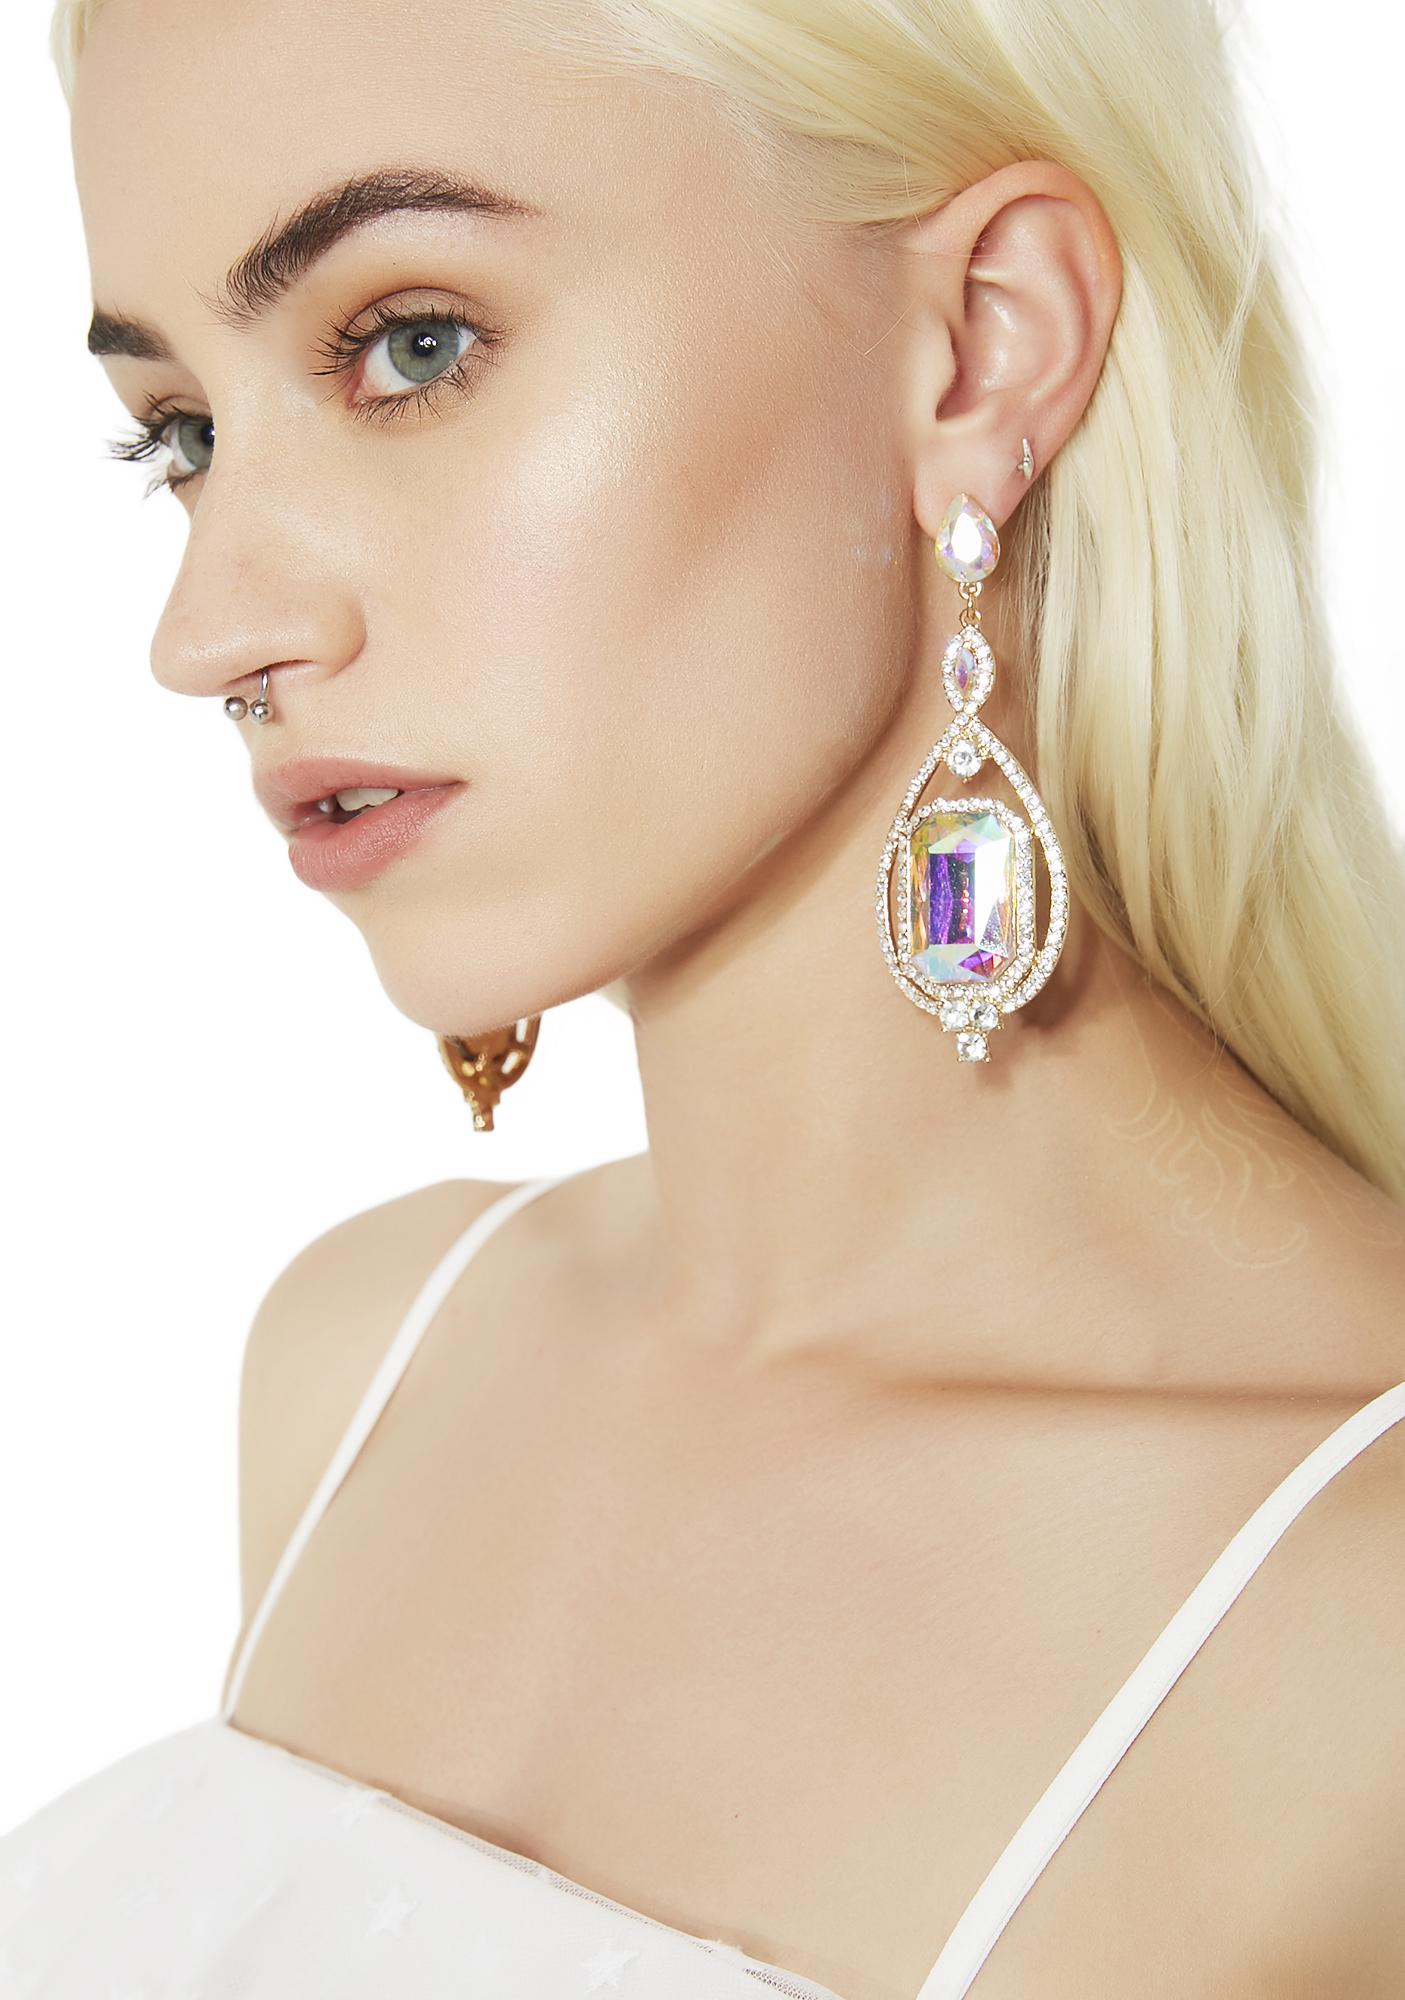 Square Iridescent Rhinestone Drop Earrings